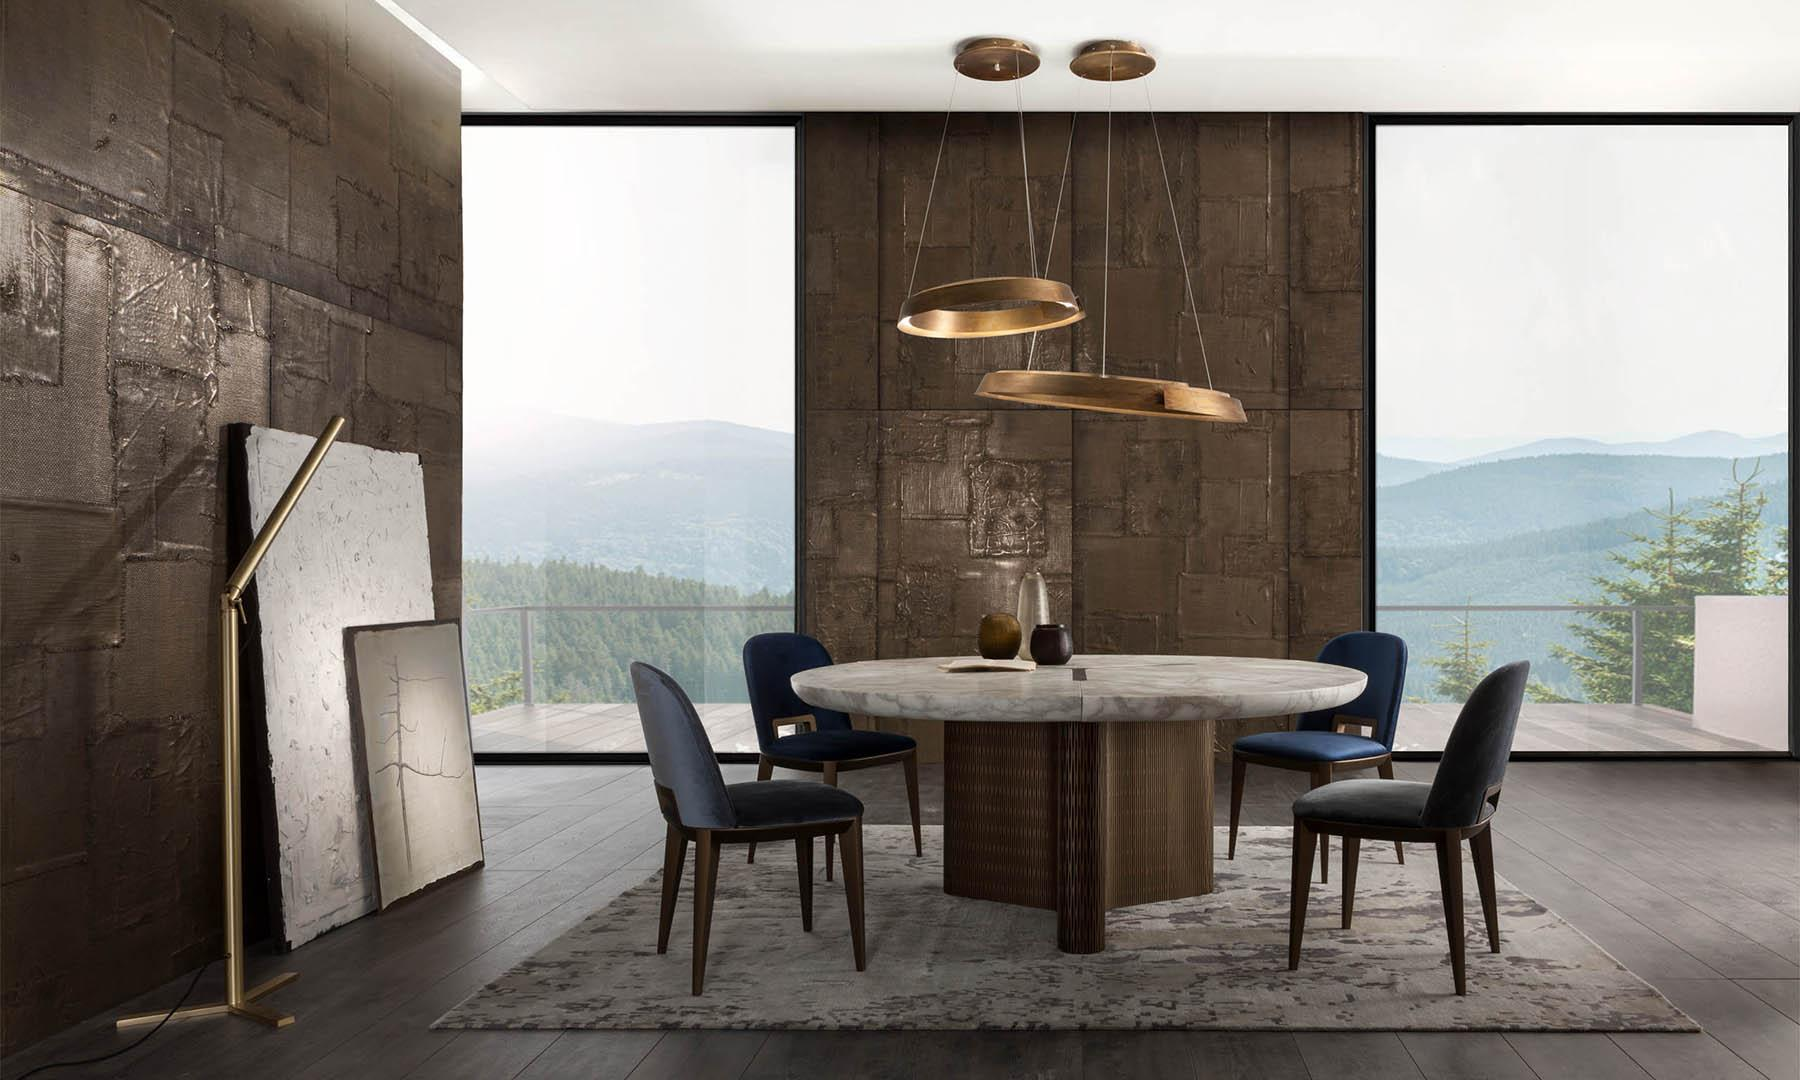 laurameroni infinity modular table for a luxury interior design